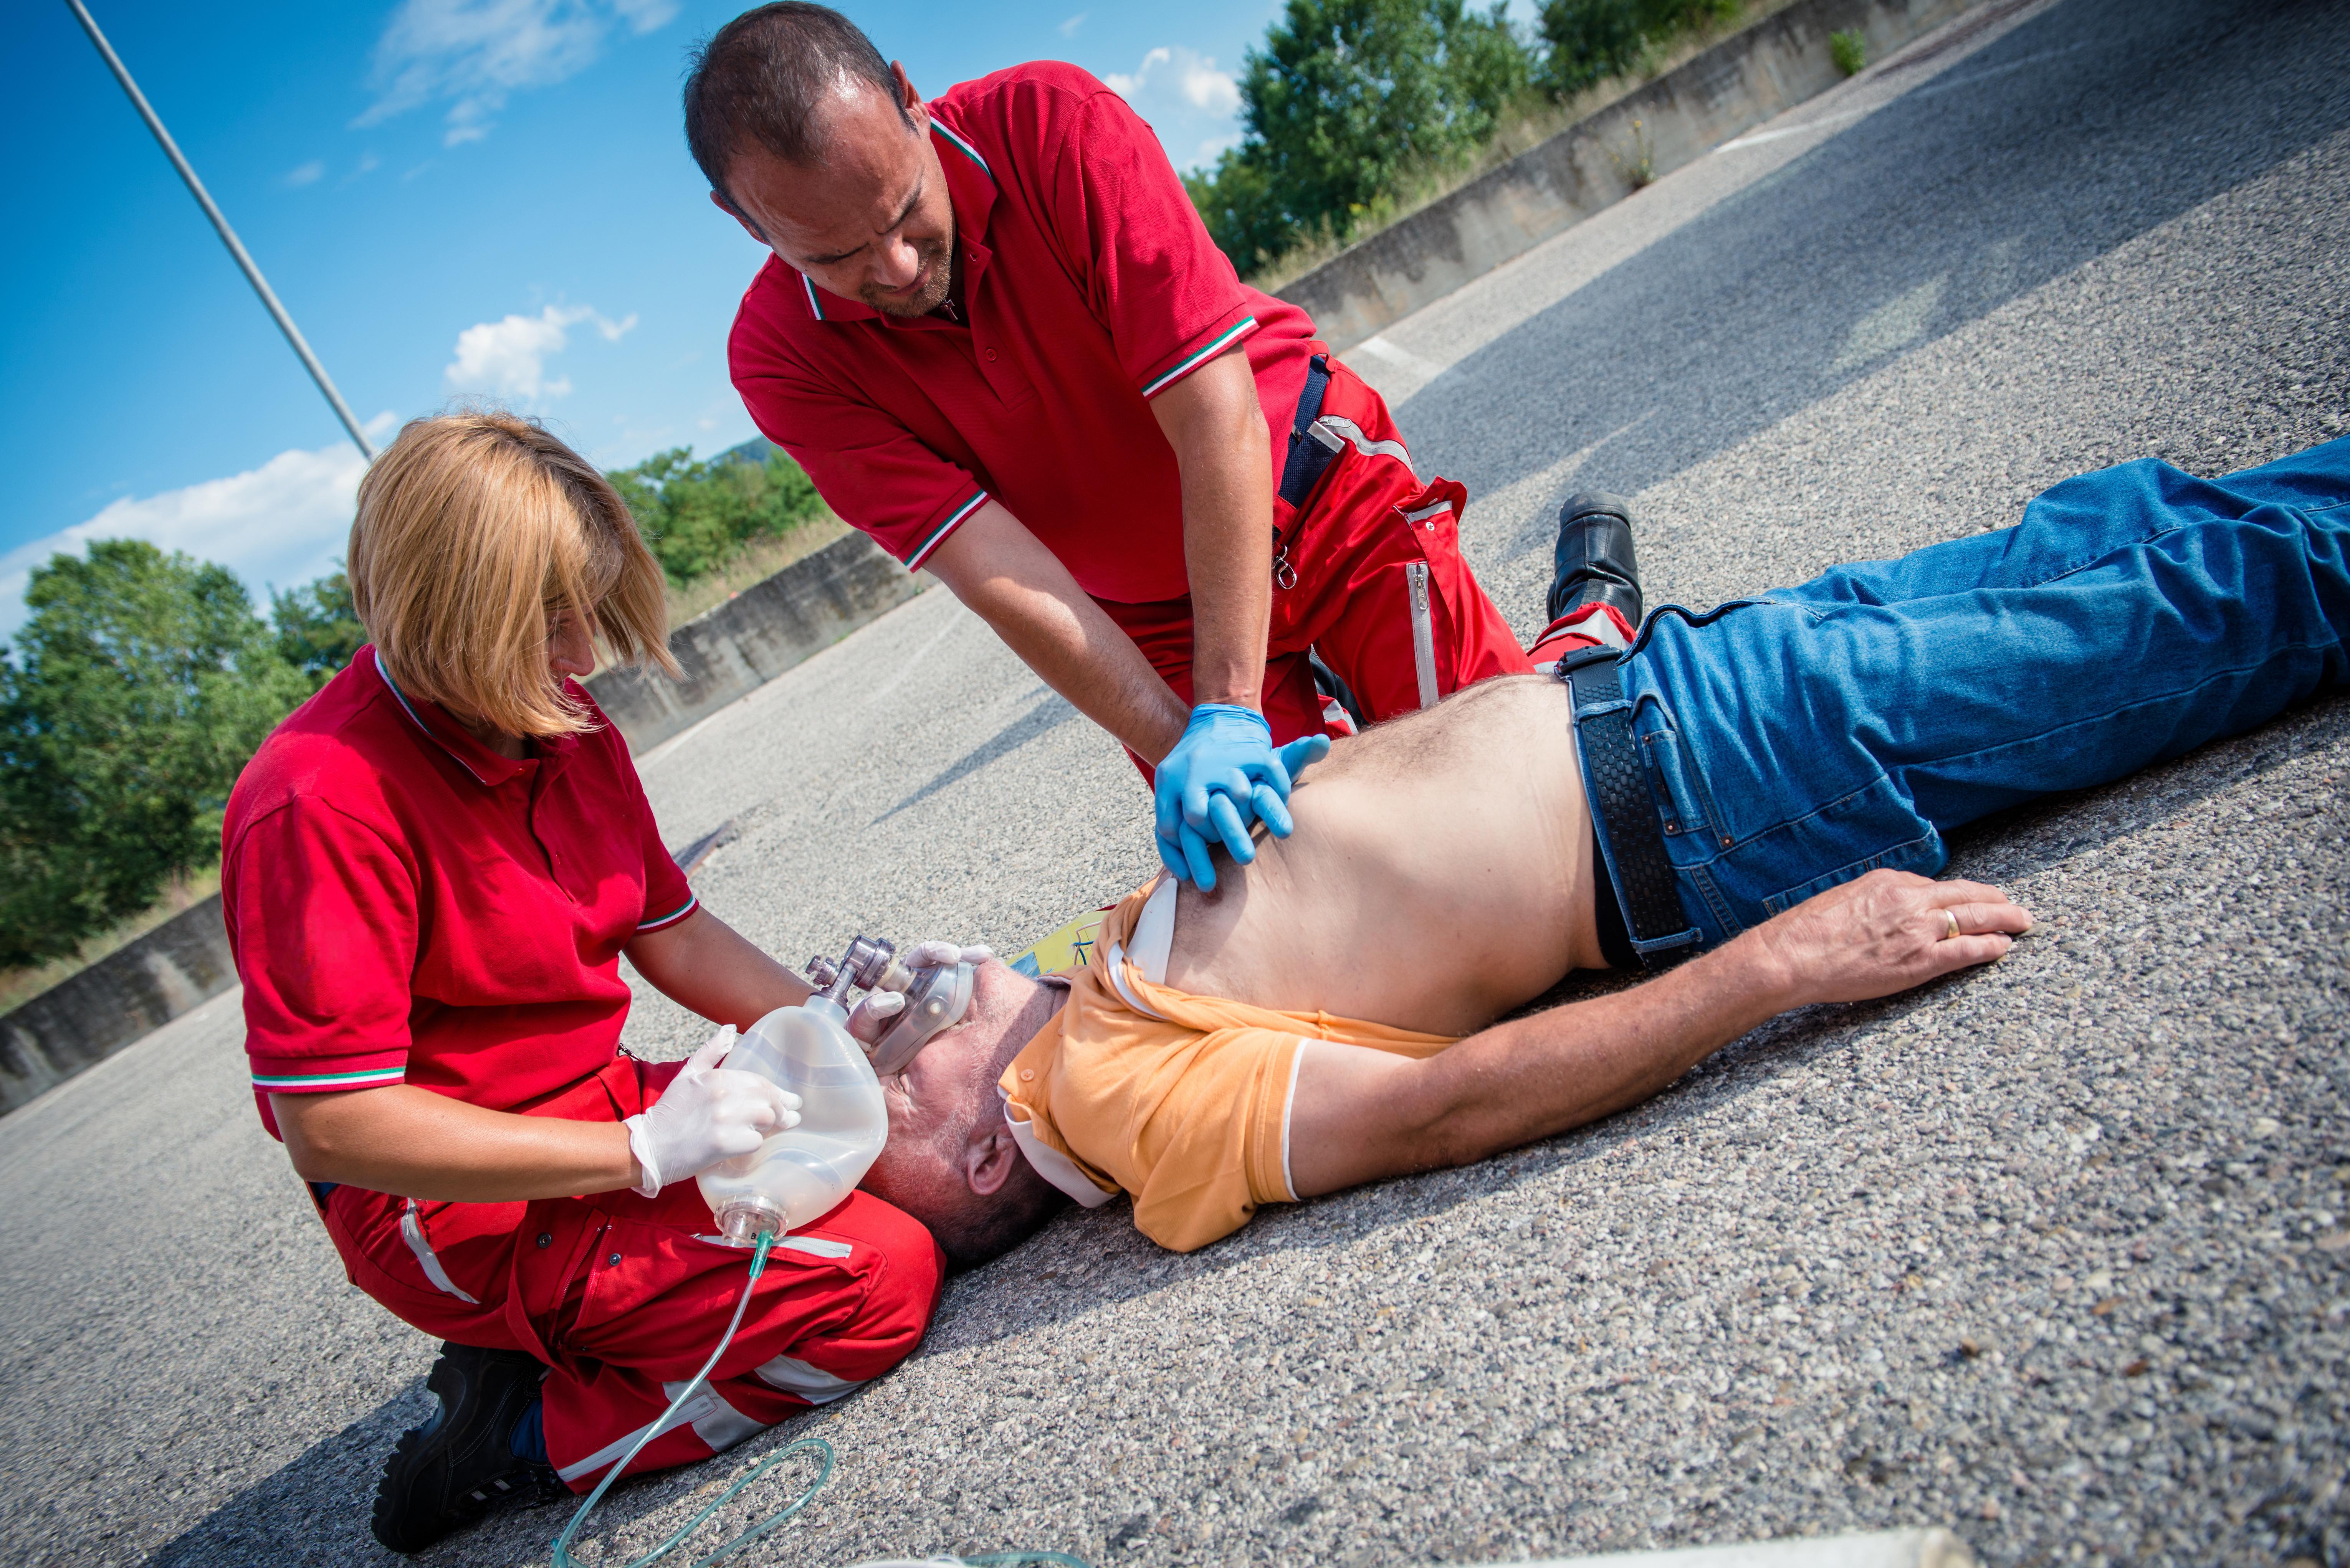 HLTAID007 Provide advanced resuscitation